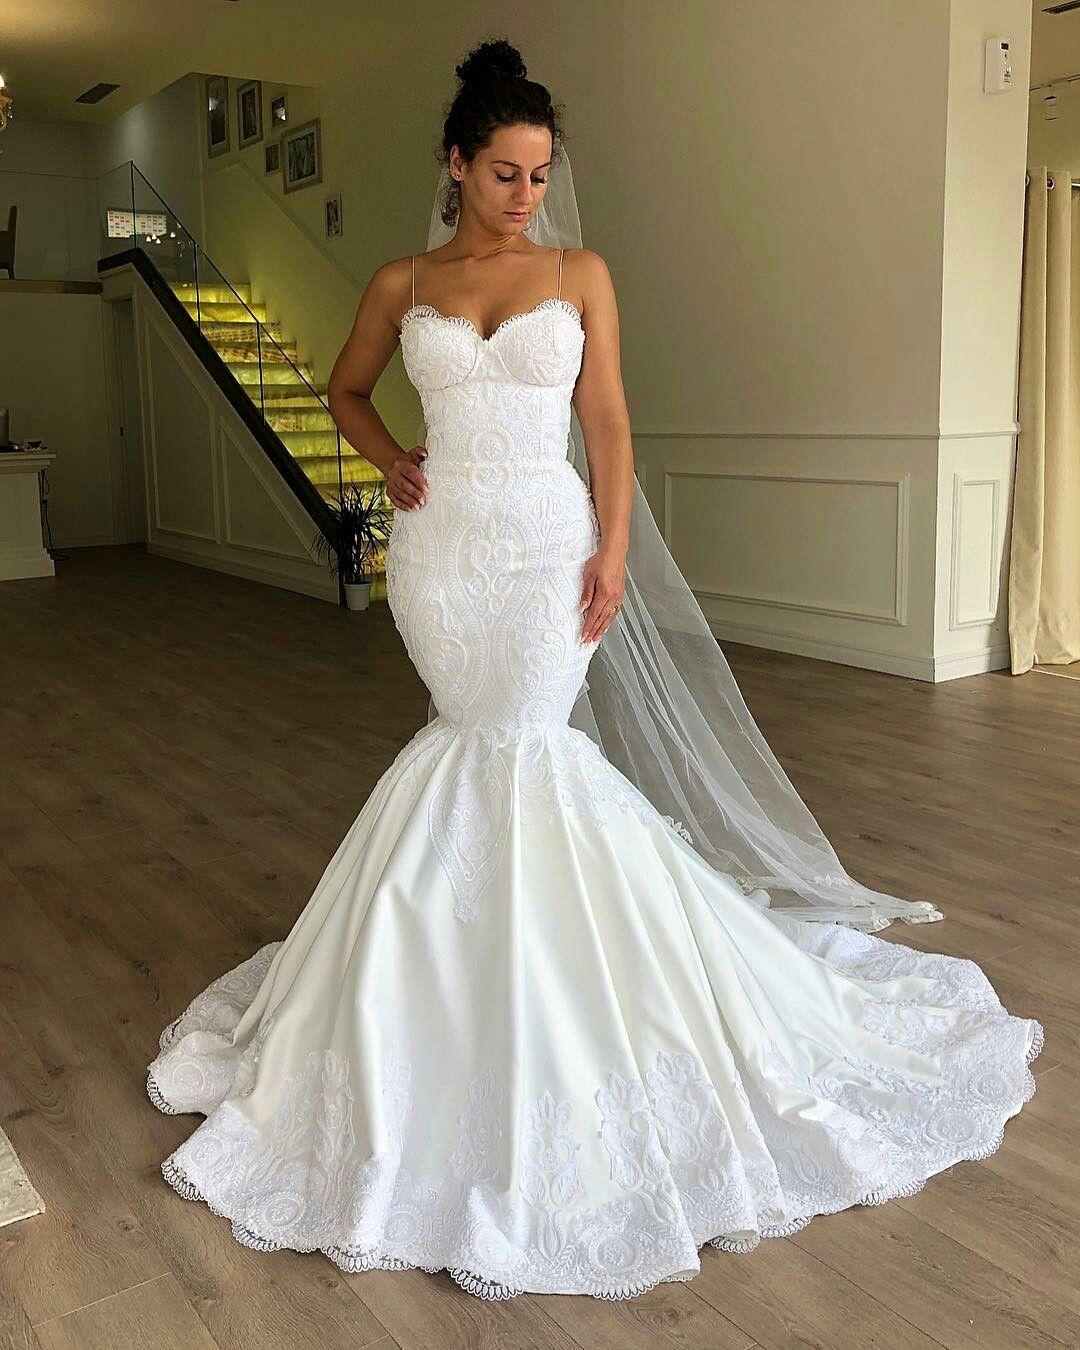 ғsℓℓsw Mye Rollody Online Wedding Dress Ball Gowns Wedding Mermaid Wedding Dress [ 1350 x 1080 Pixel ]